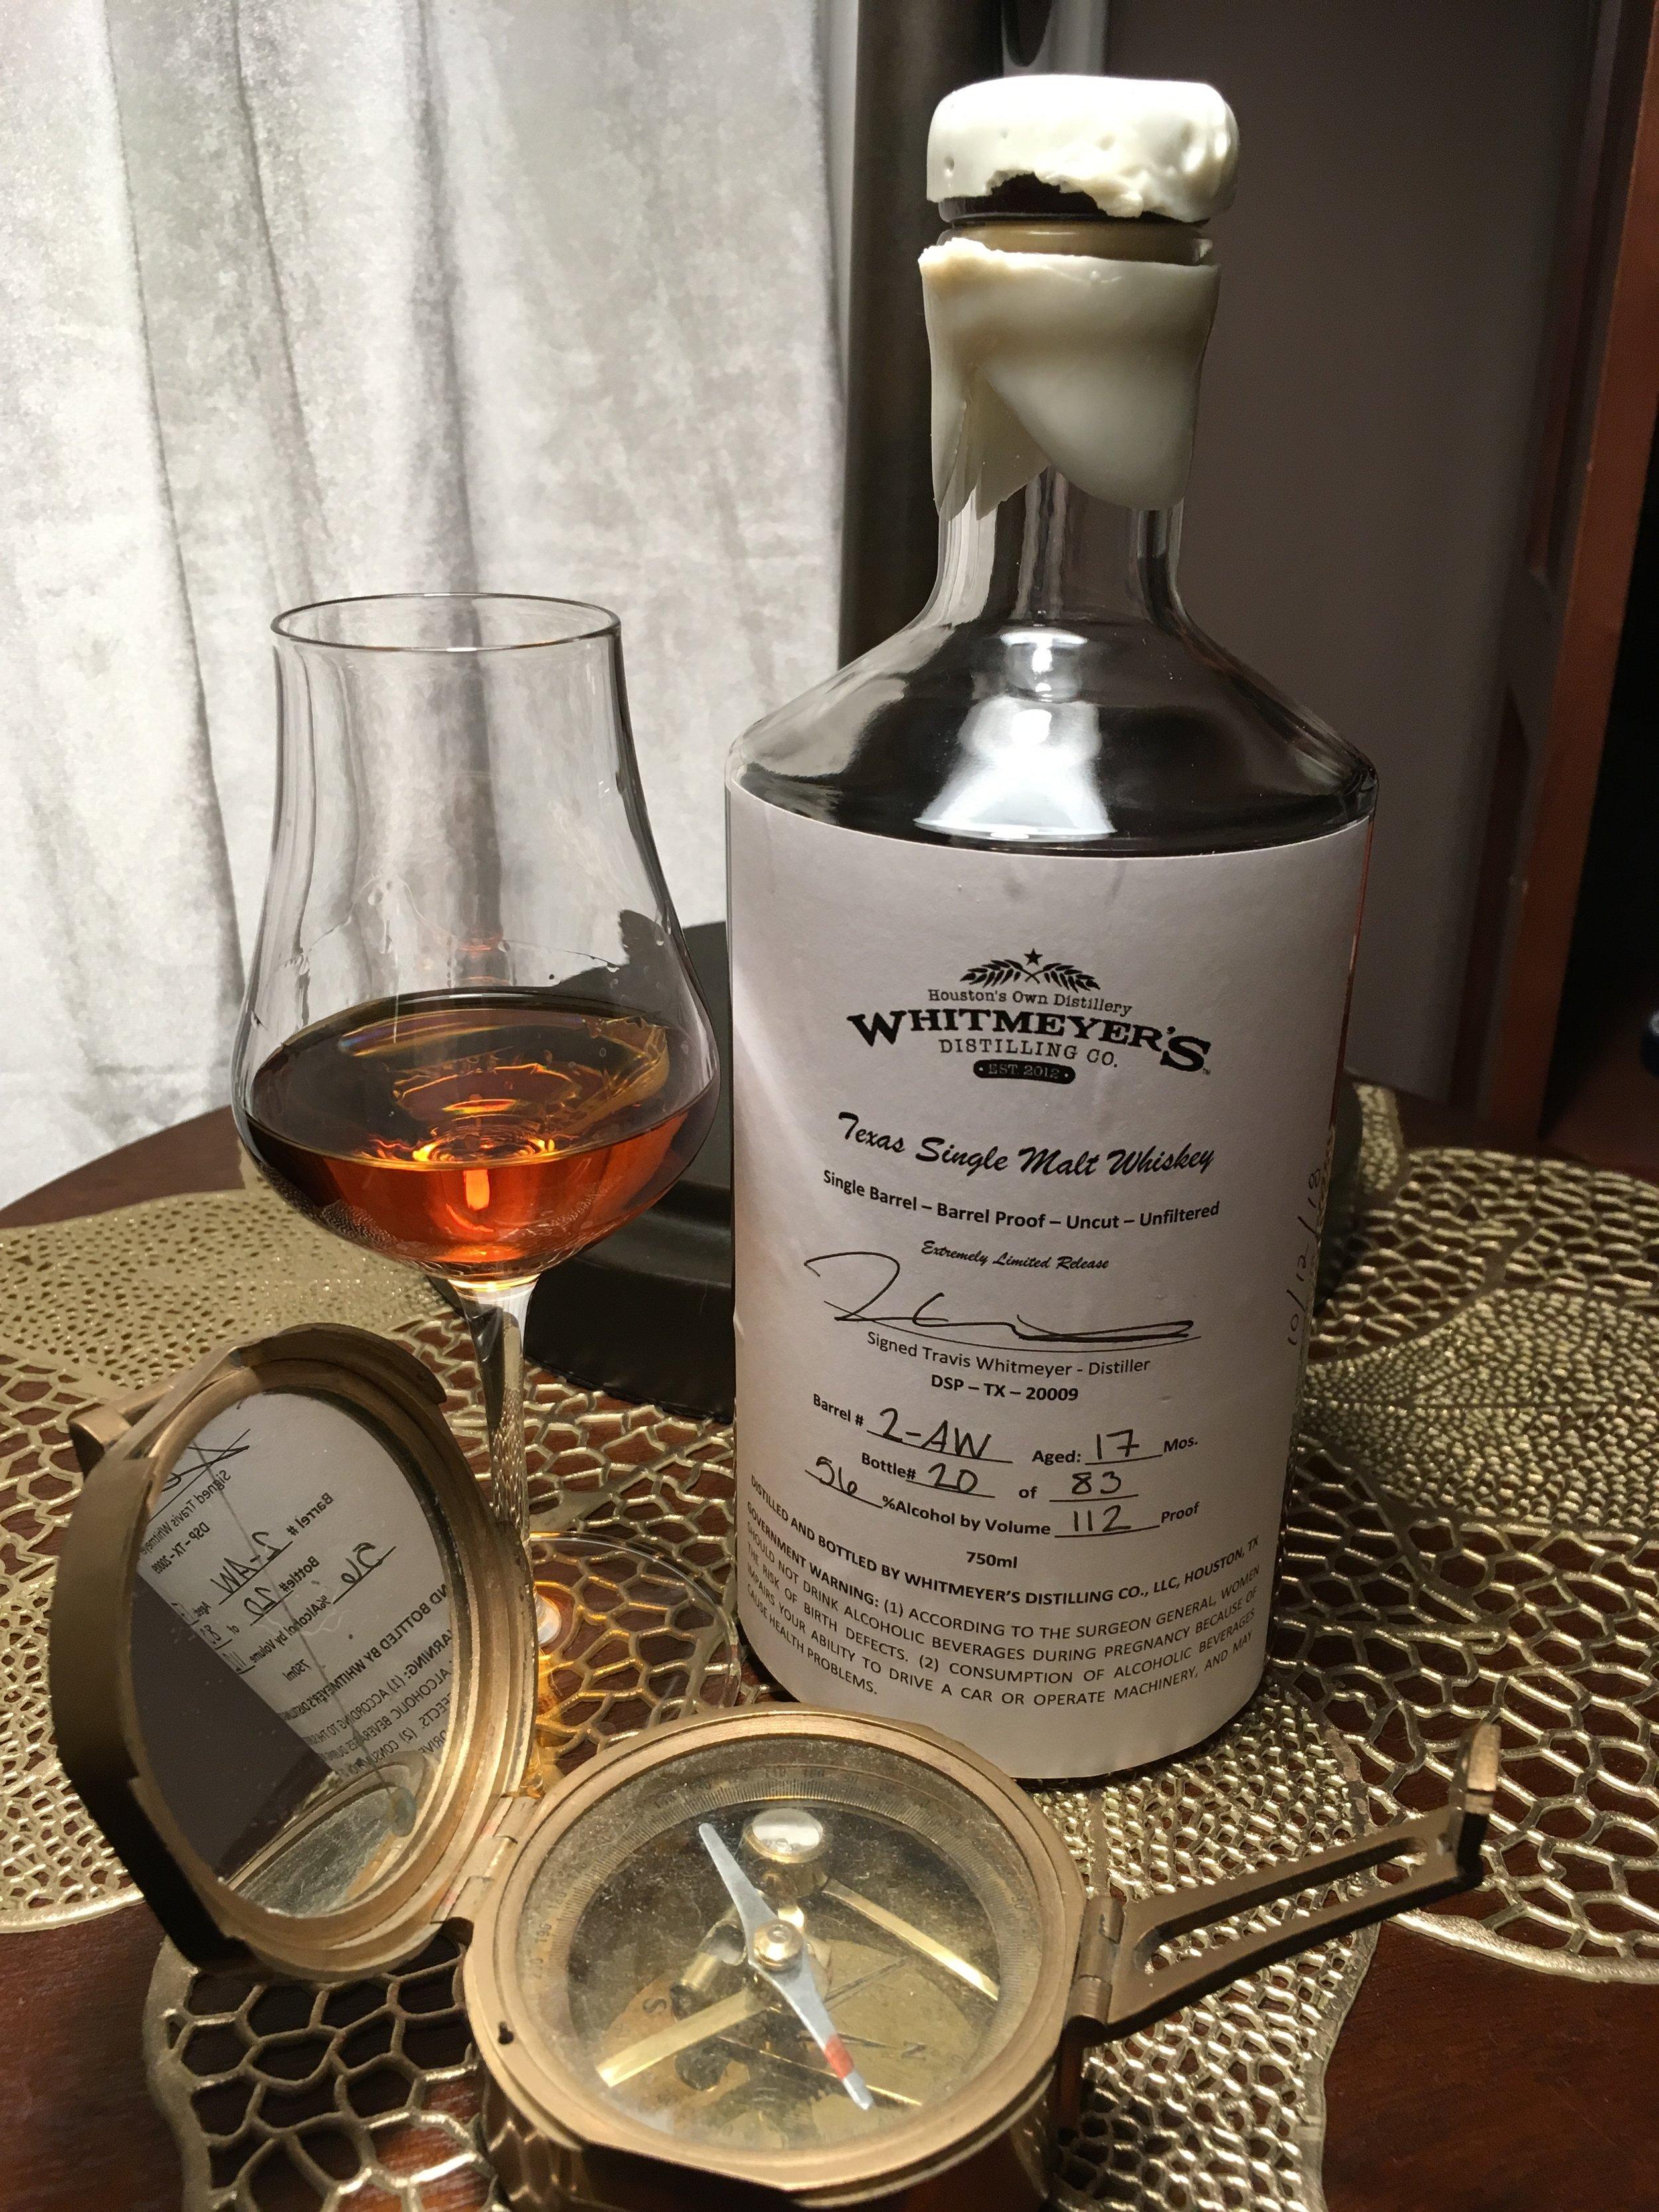 112 proof, grain-to-glass Texas single malt whiskey!